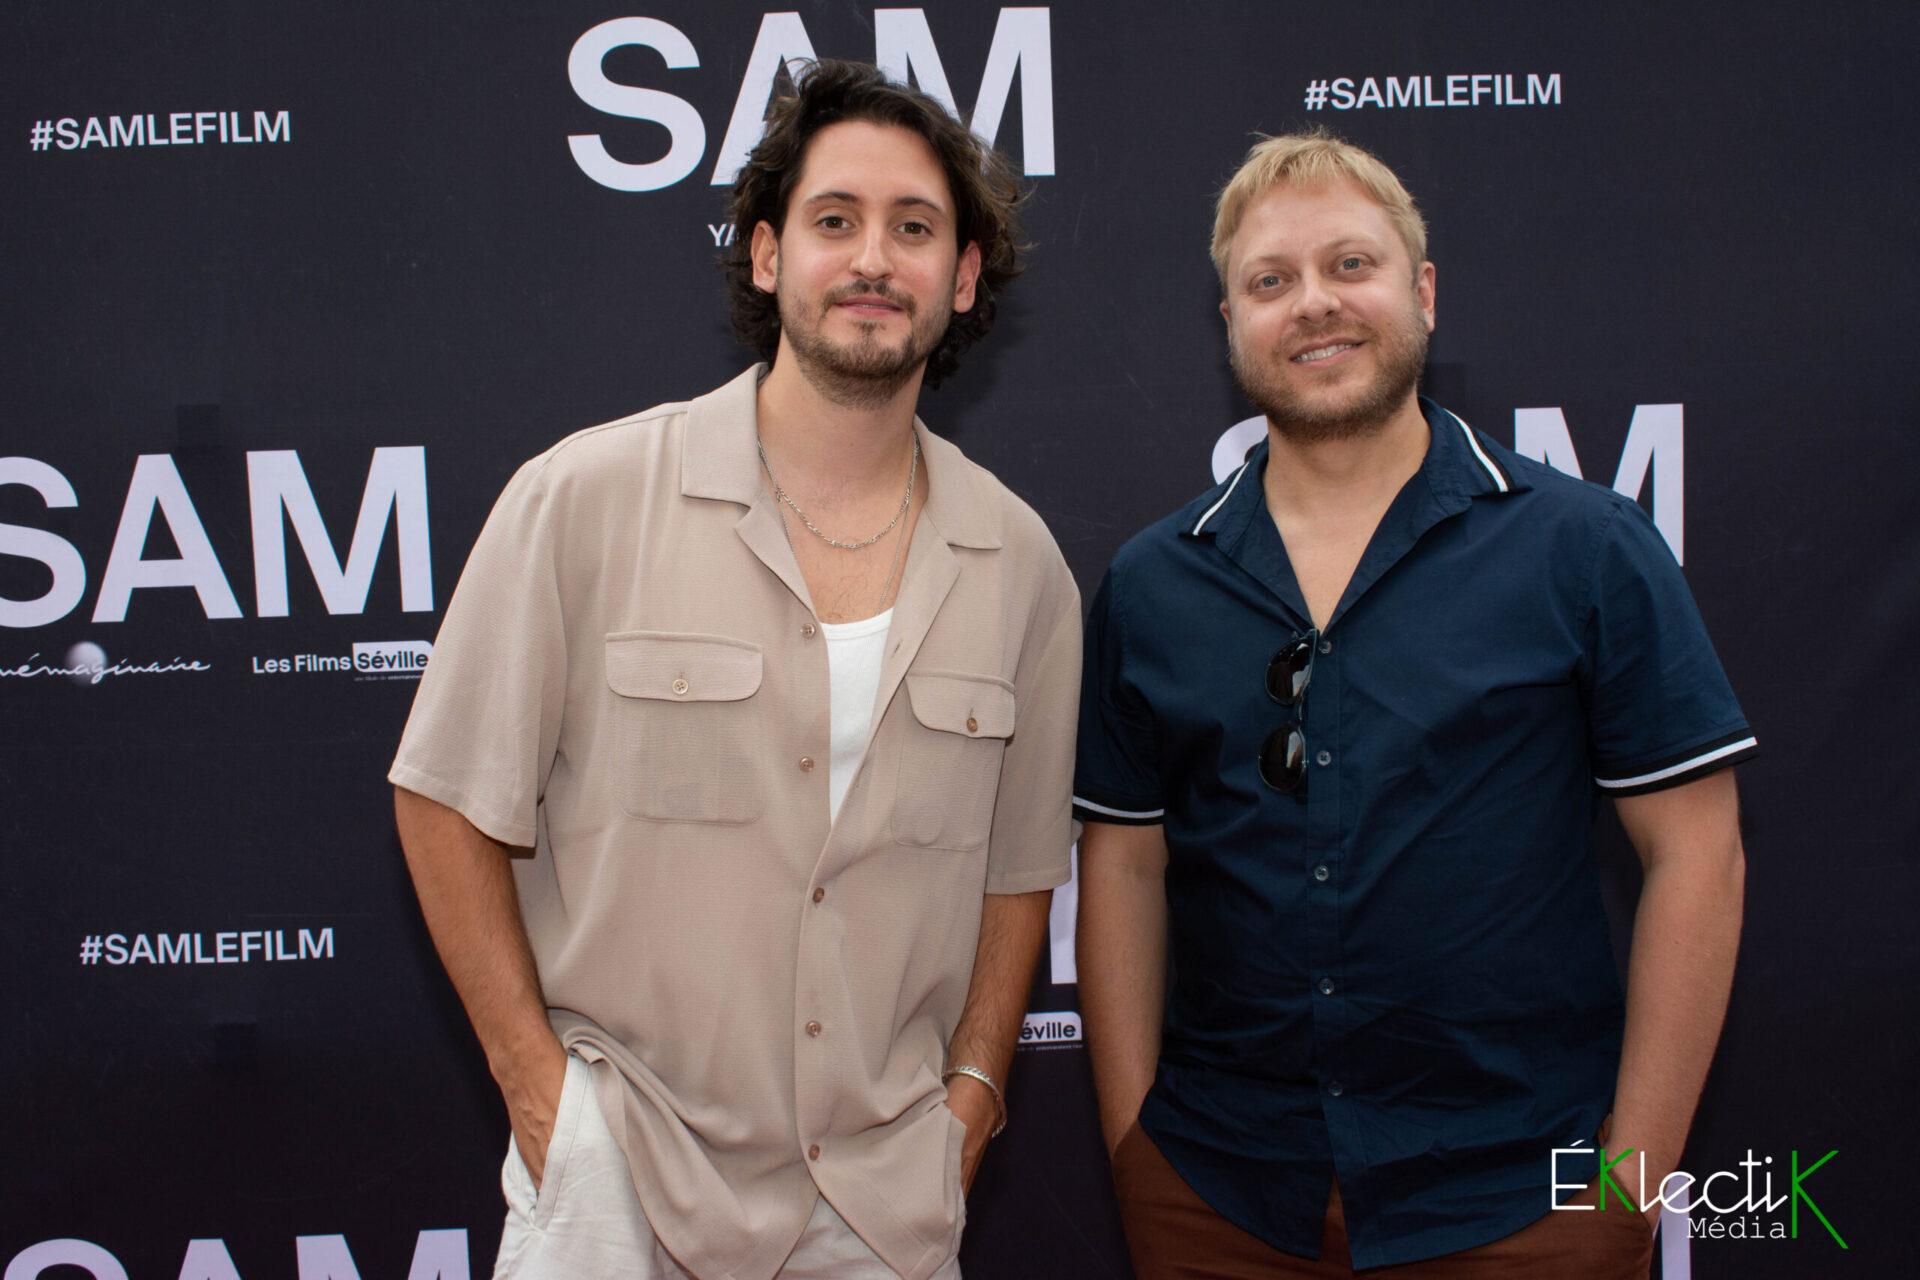 Lou-Pascal Tremblay et Guillaume Lambert